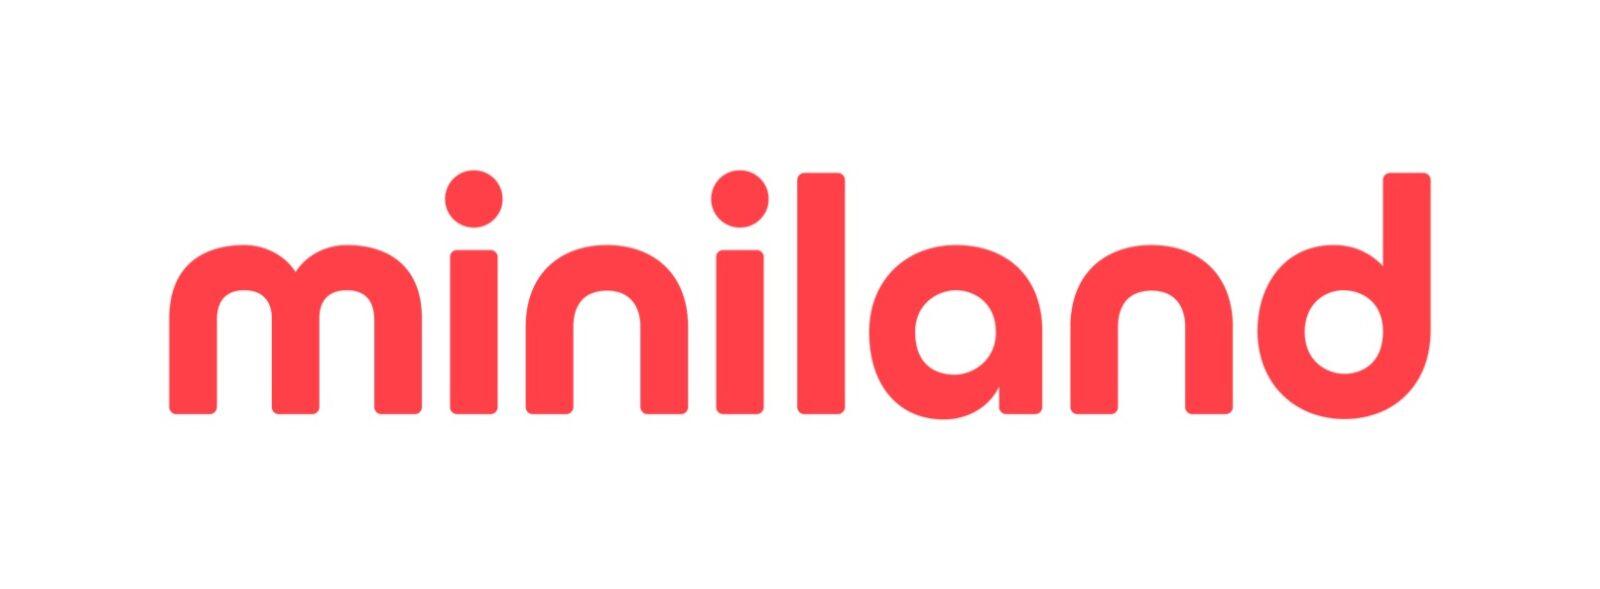 Logo der Marke Miniland Baby